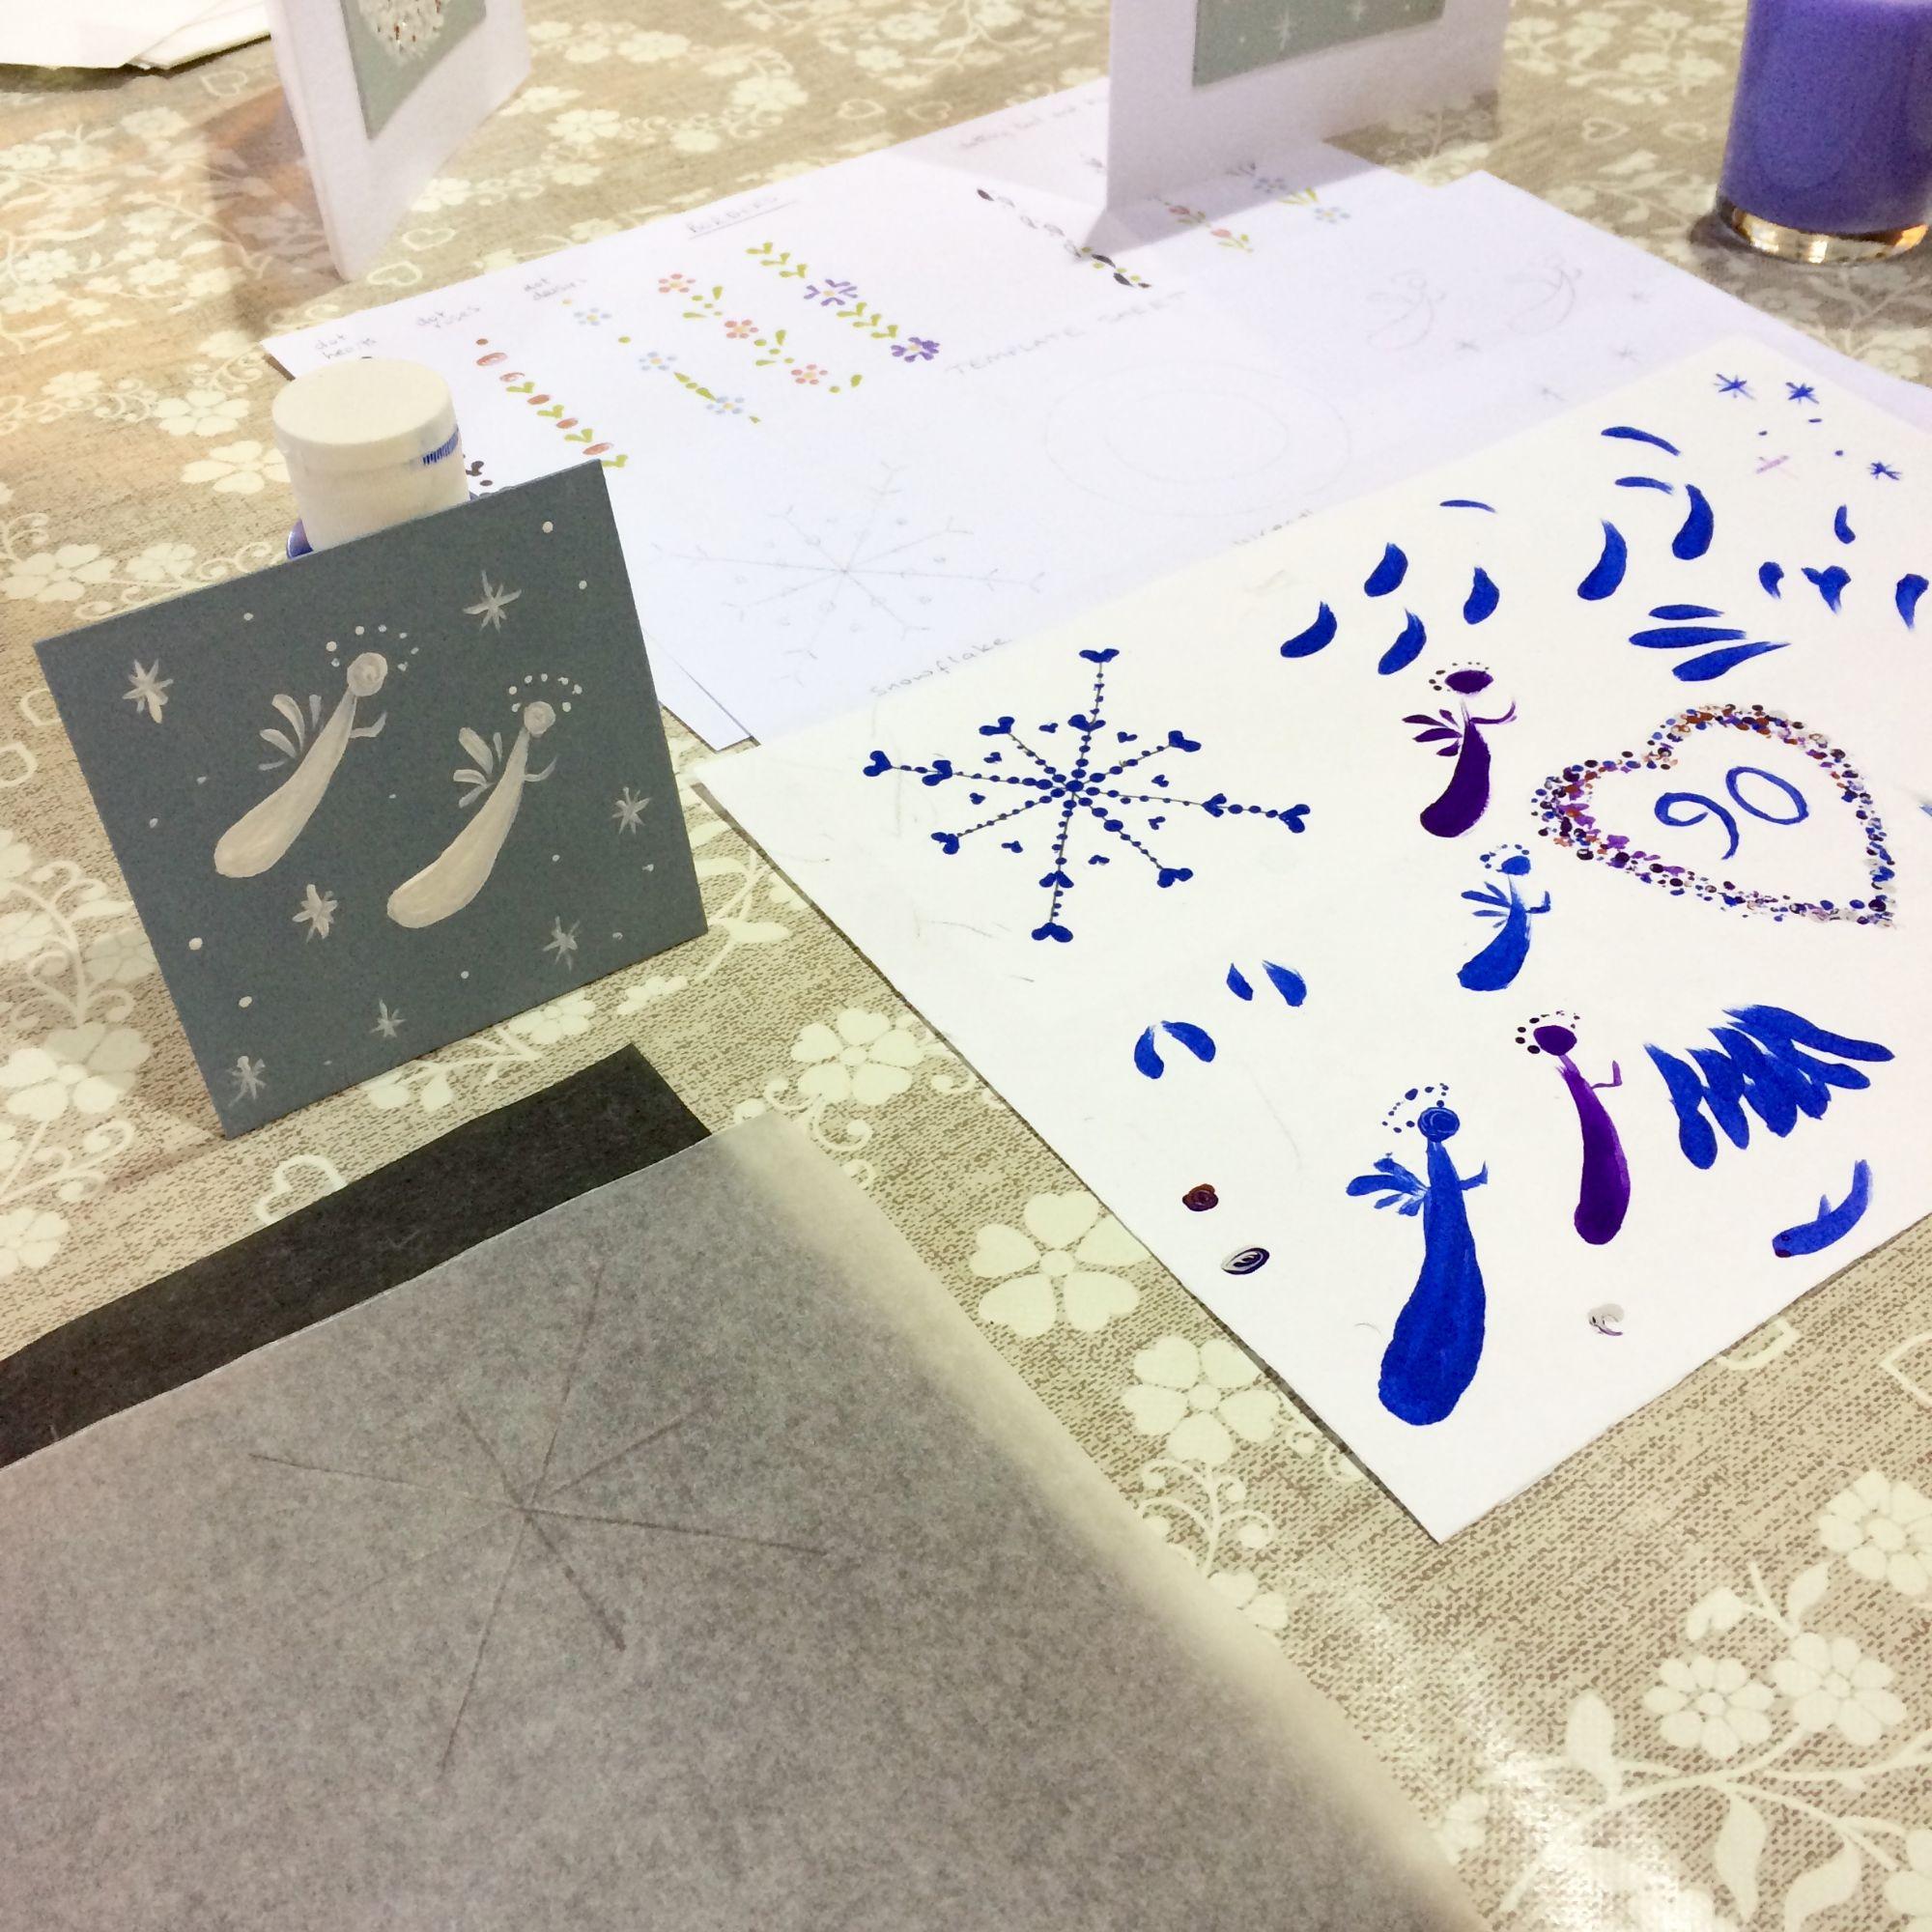 Festive Folk Art Painting Workshop - Angels